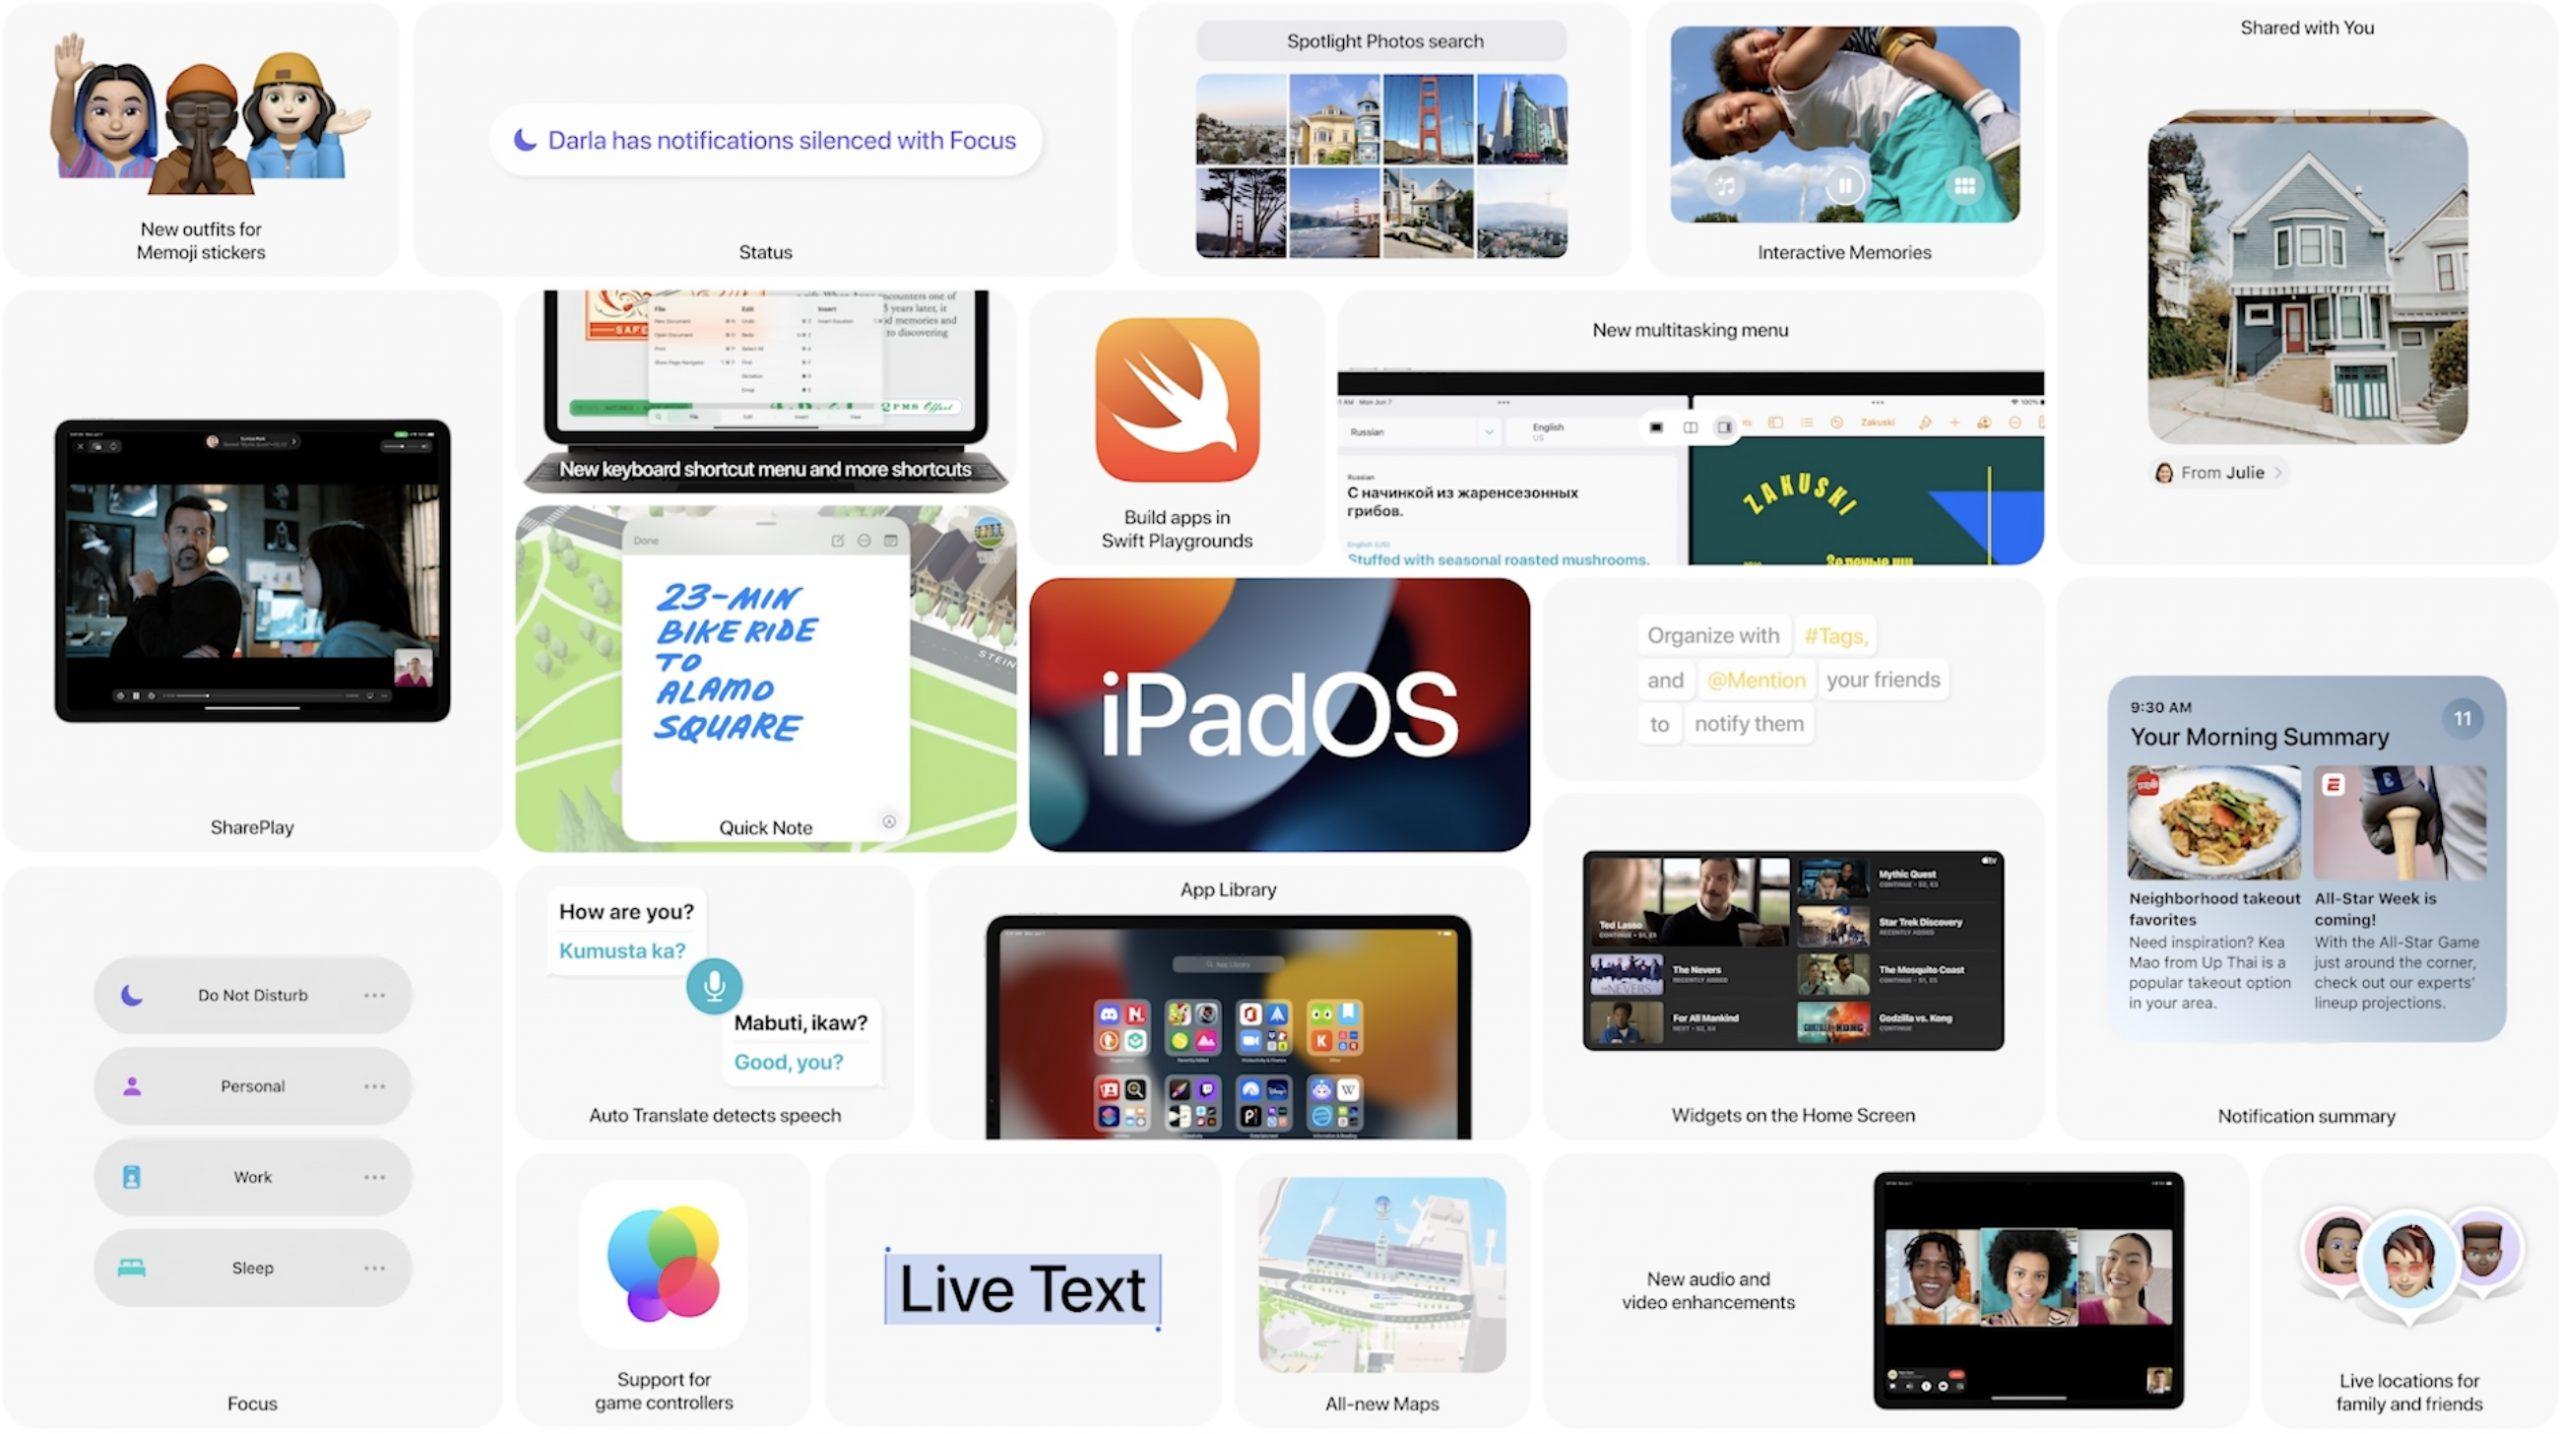 iPad OS 15 Summary